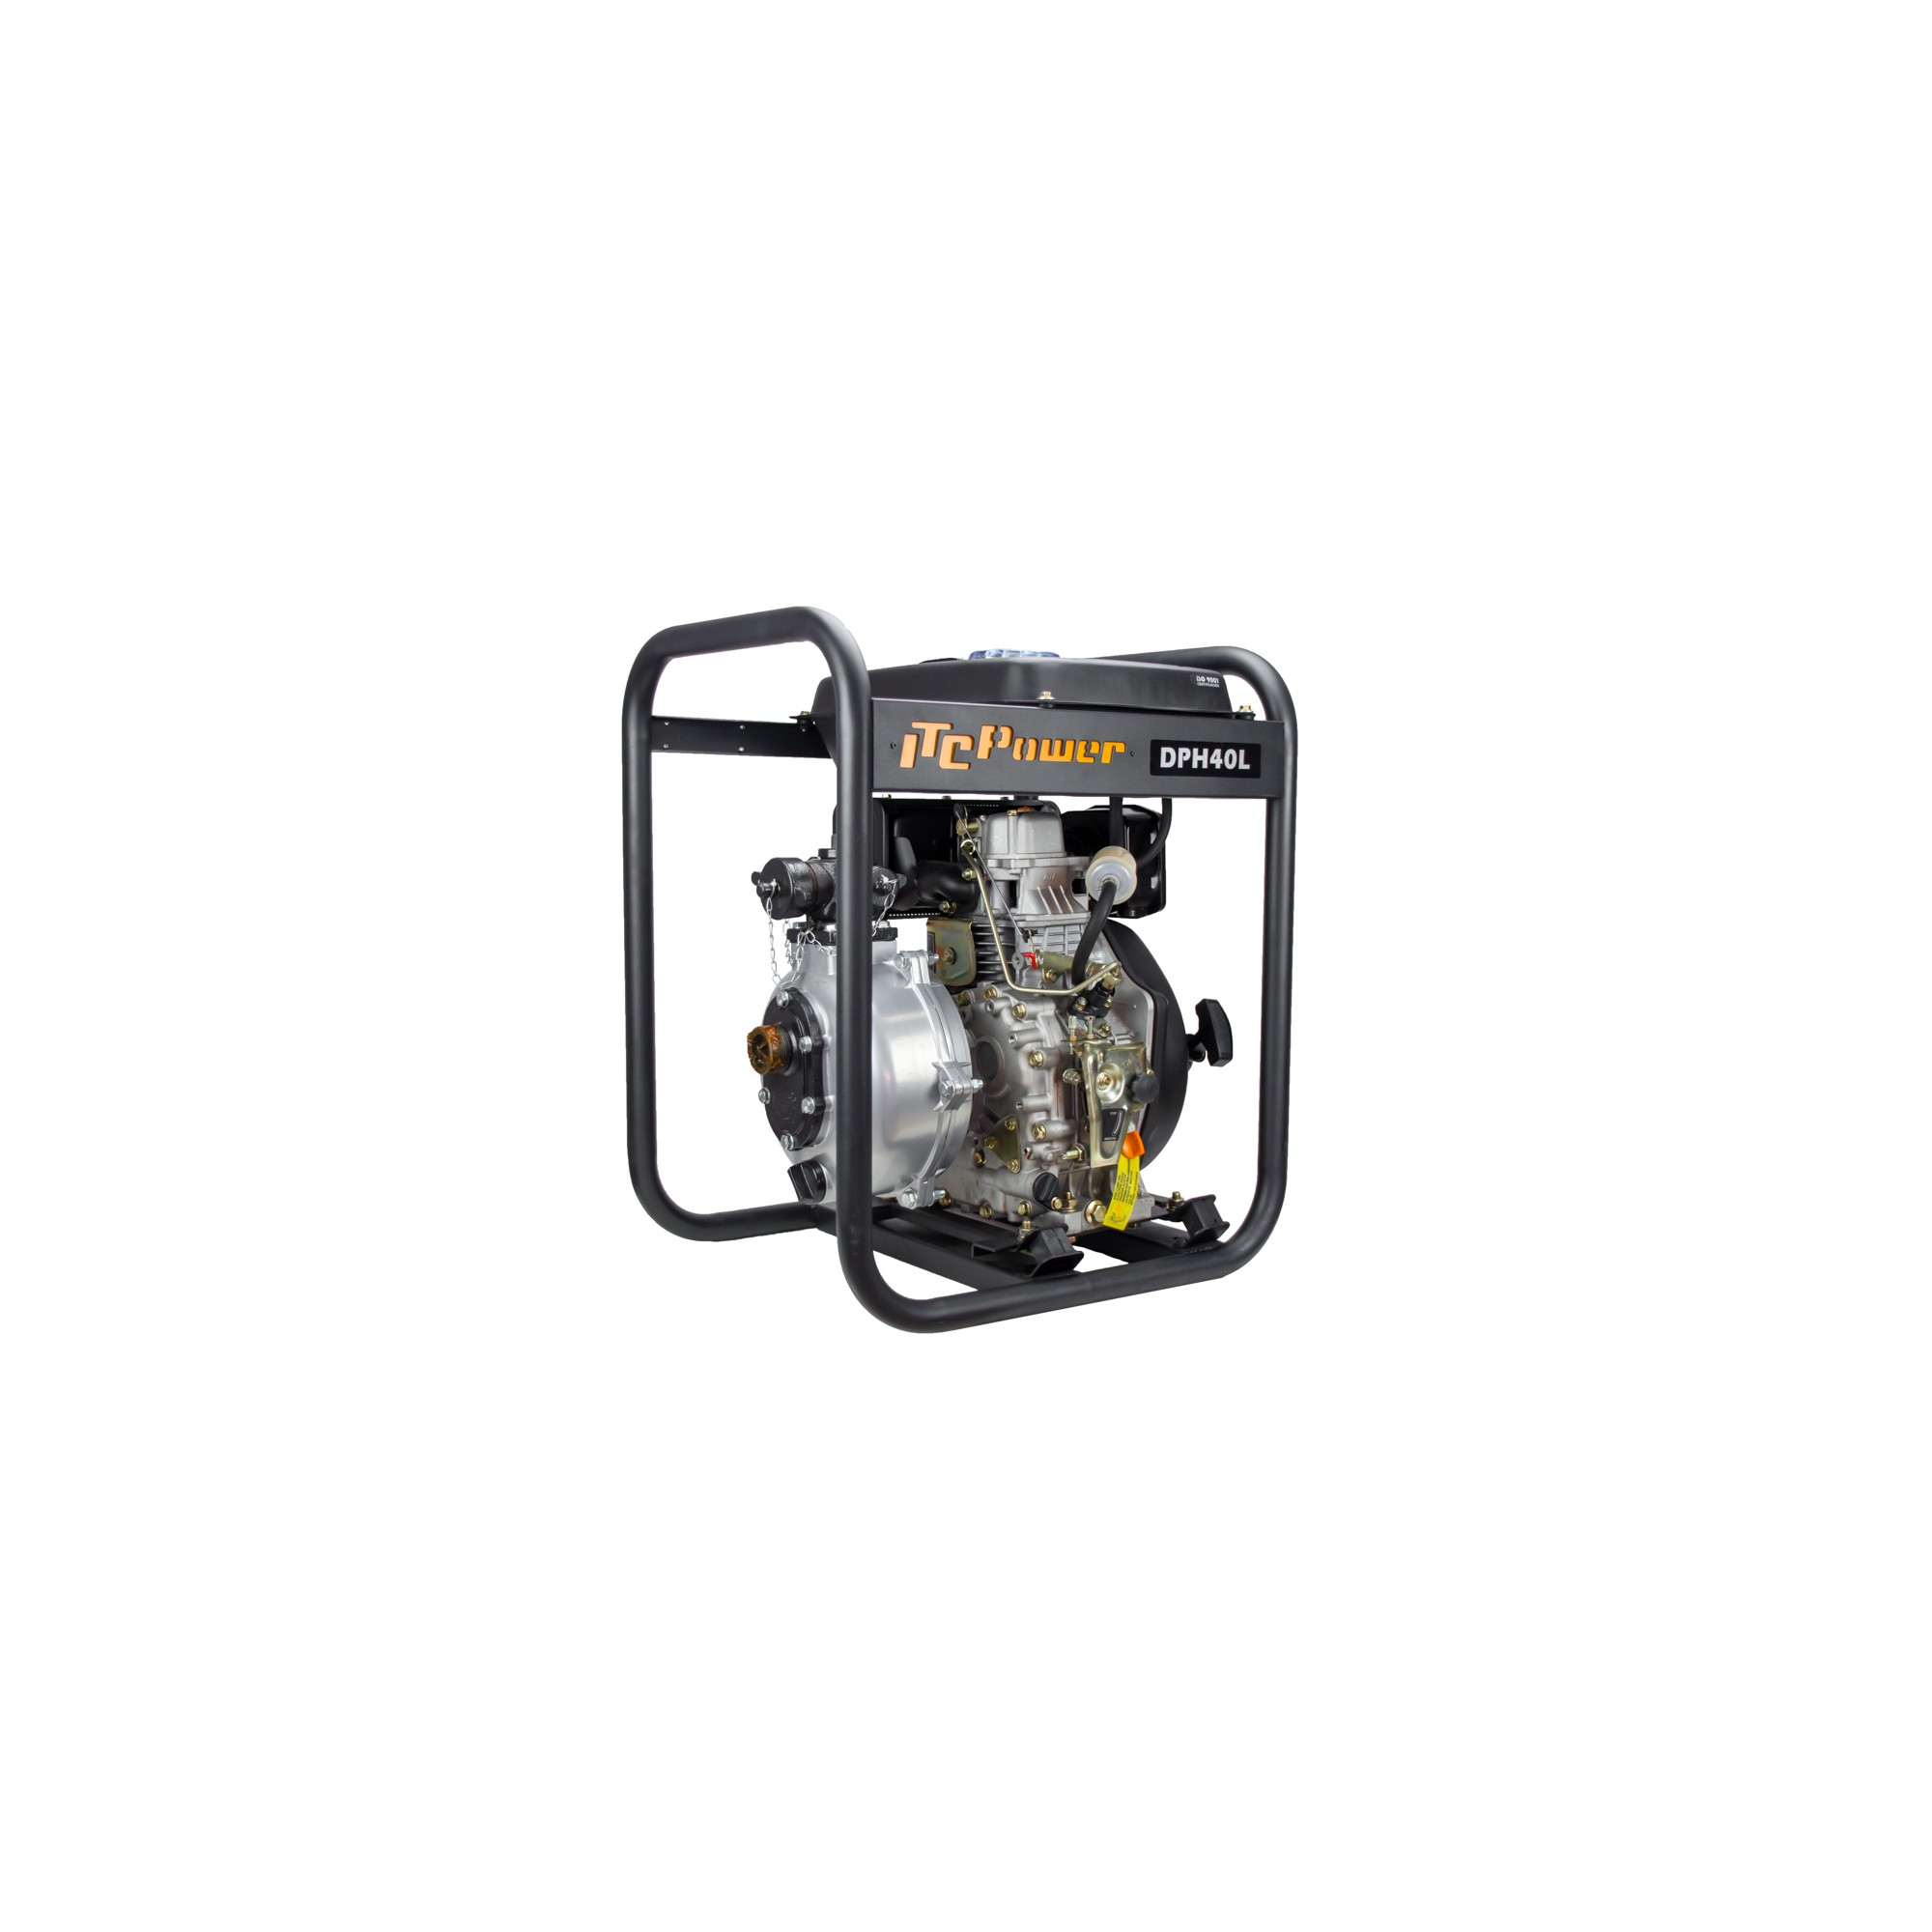 DPH40L Motobomba Diesel Alta Presión ITCPower